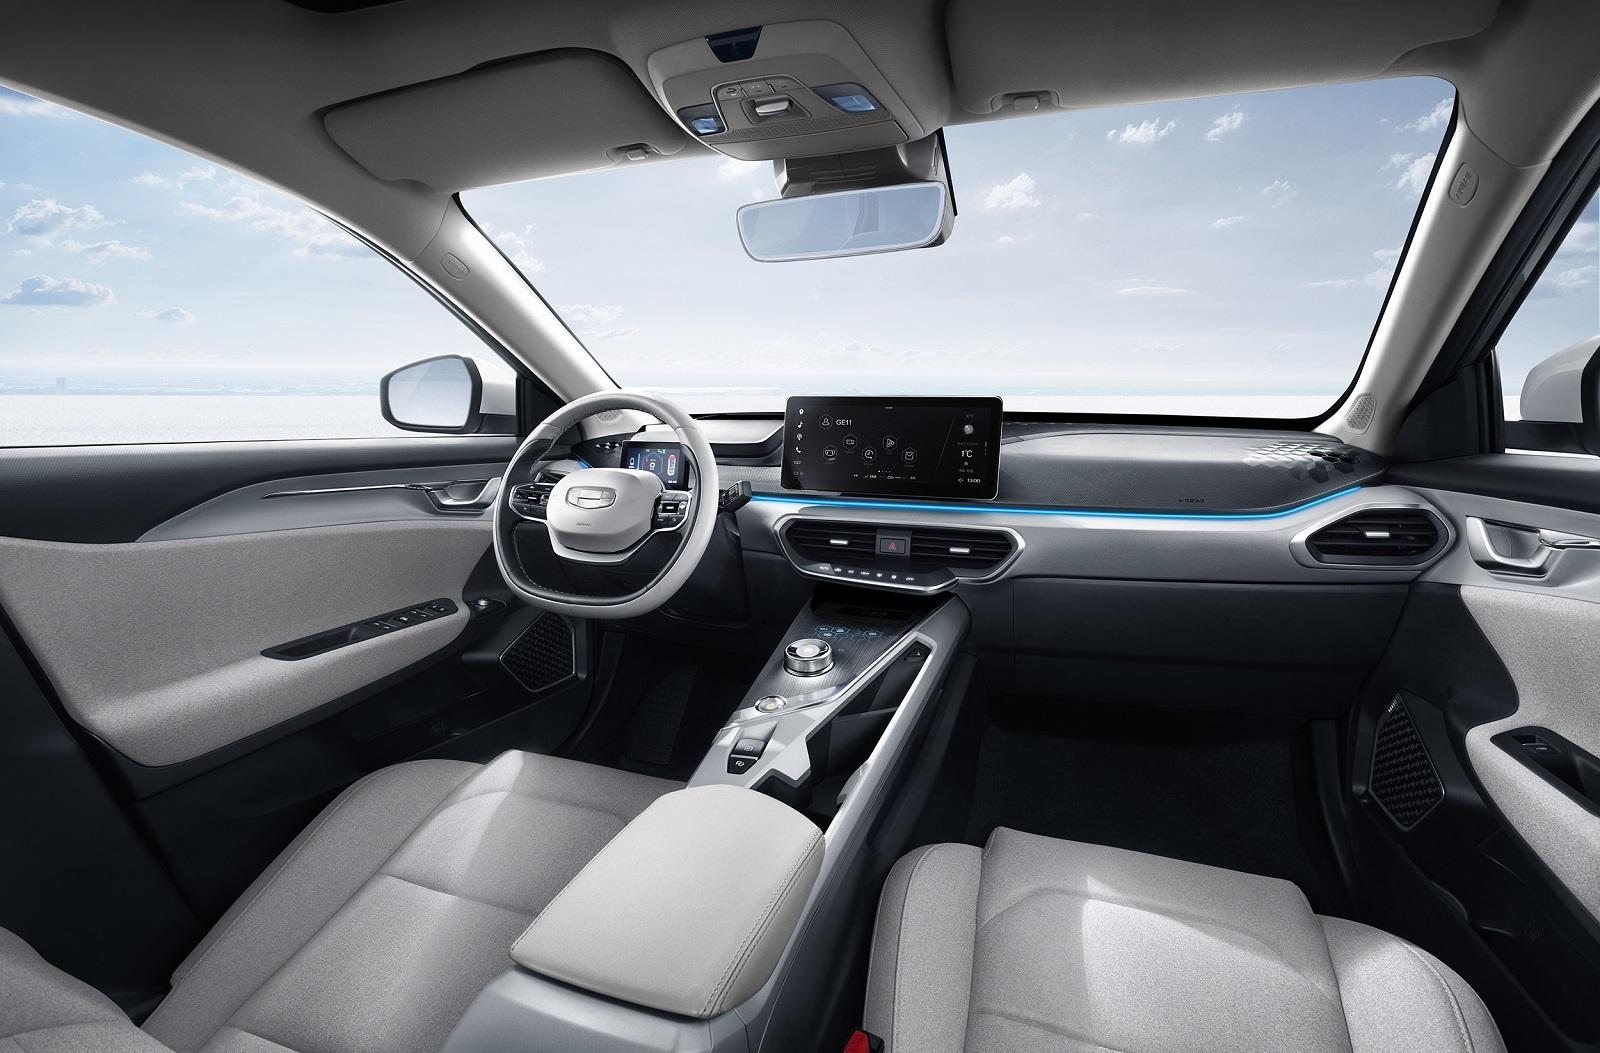 Geely Electric Auto interior